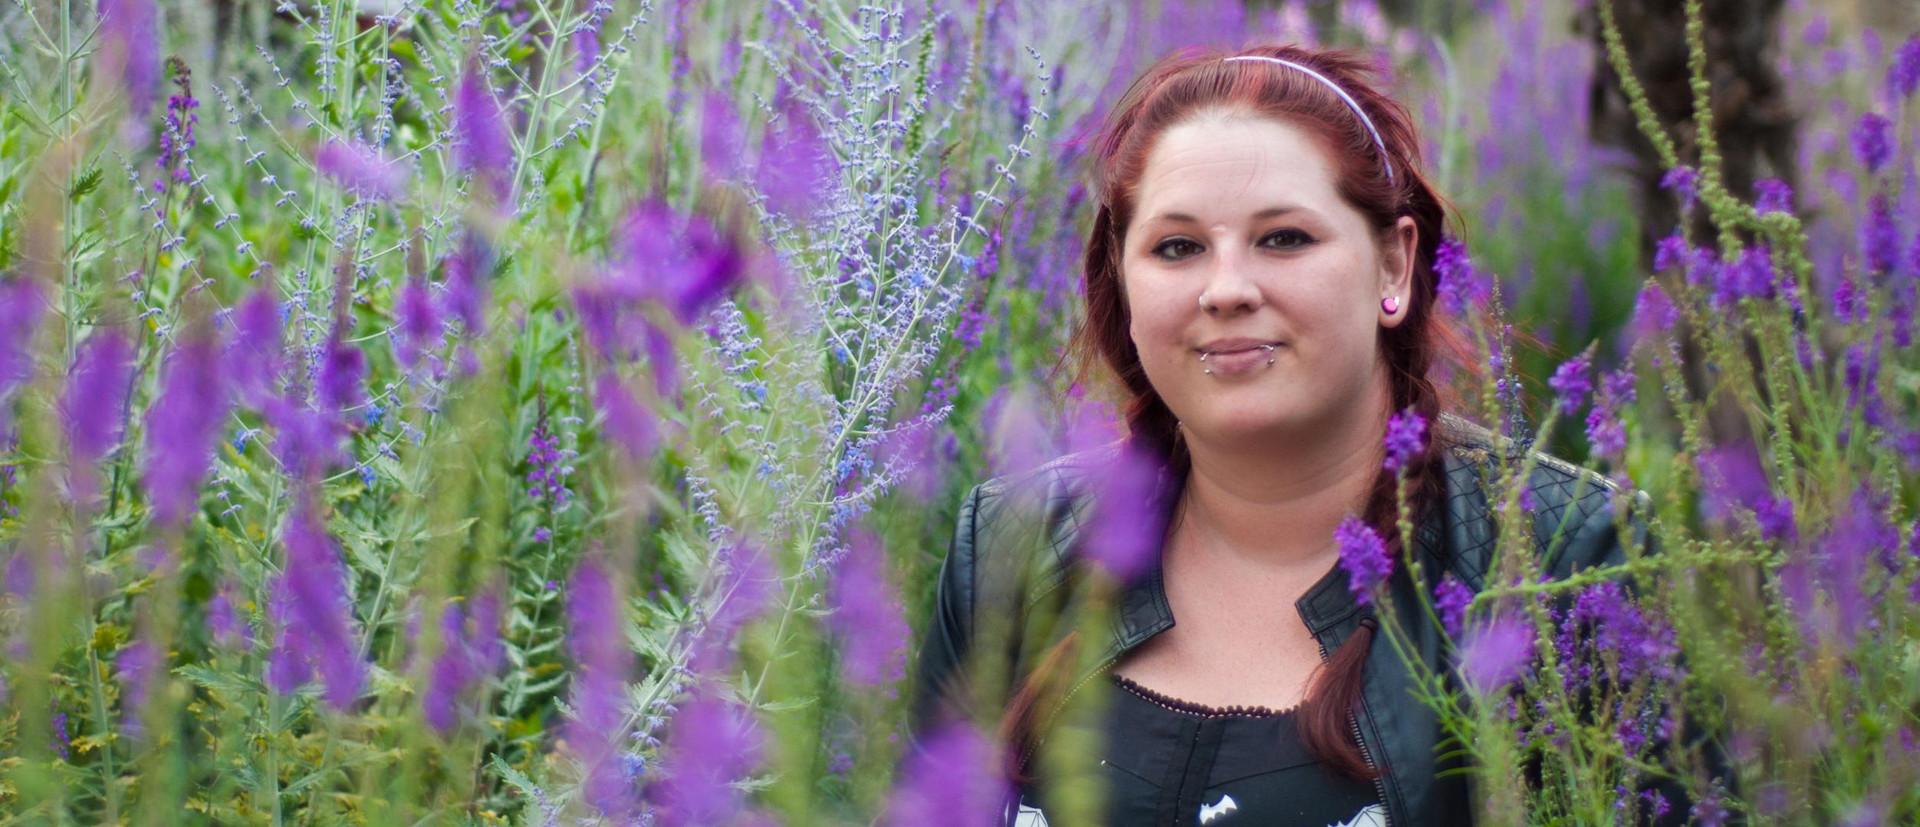 chessie in the lavender .JPG